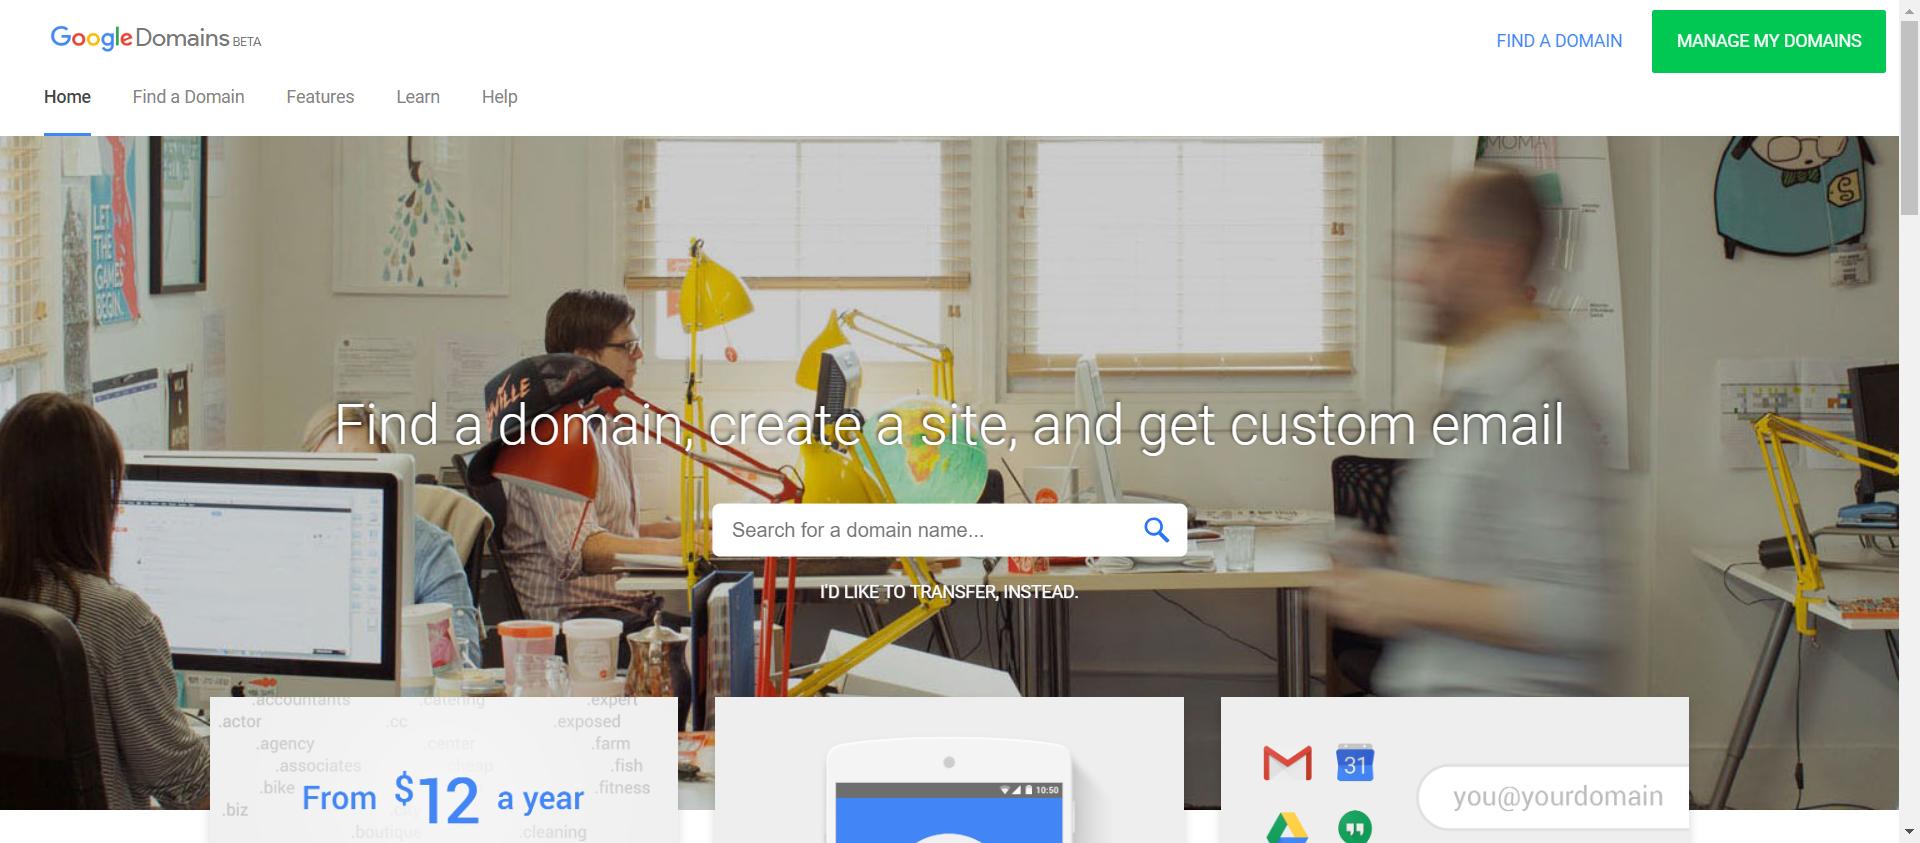 Google Domains website image